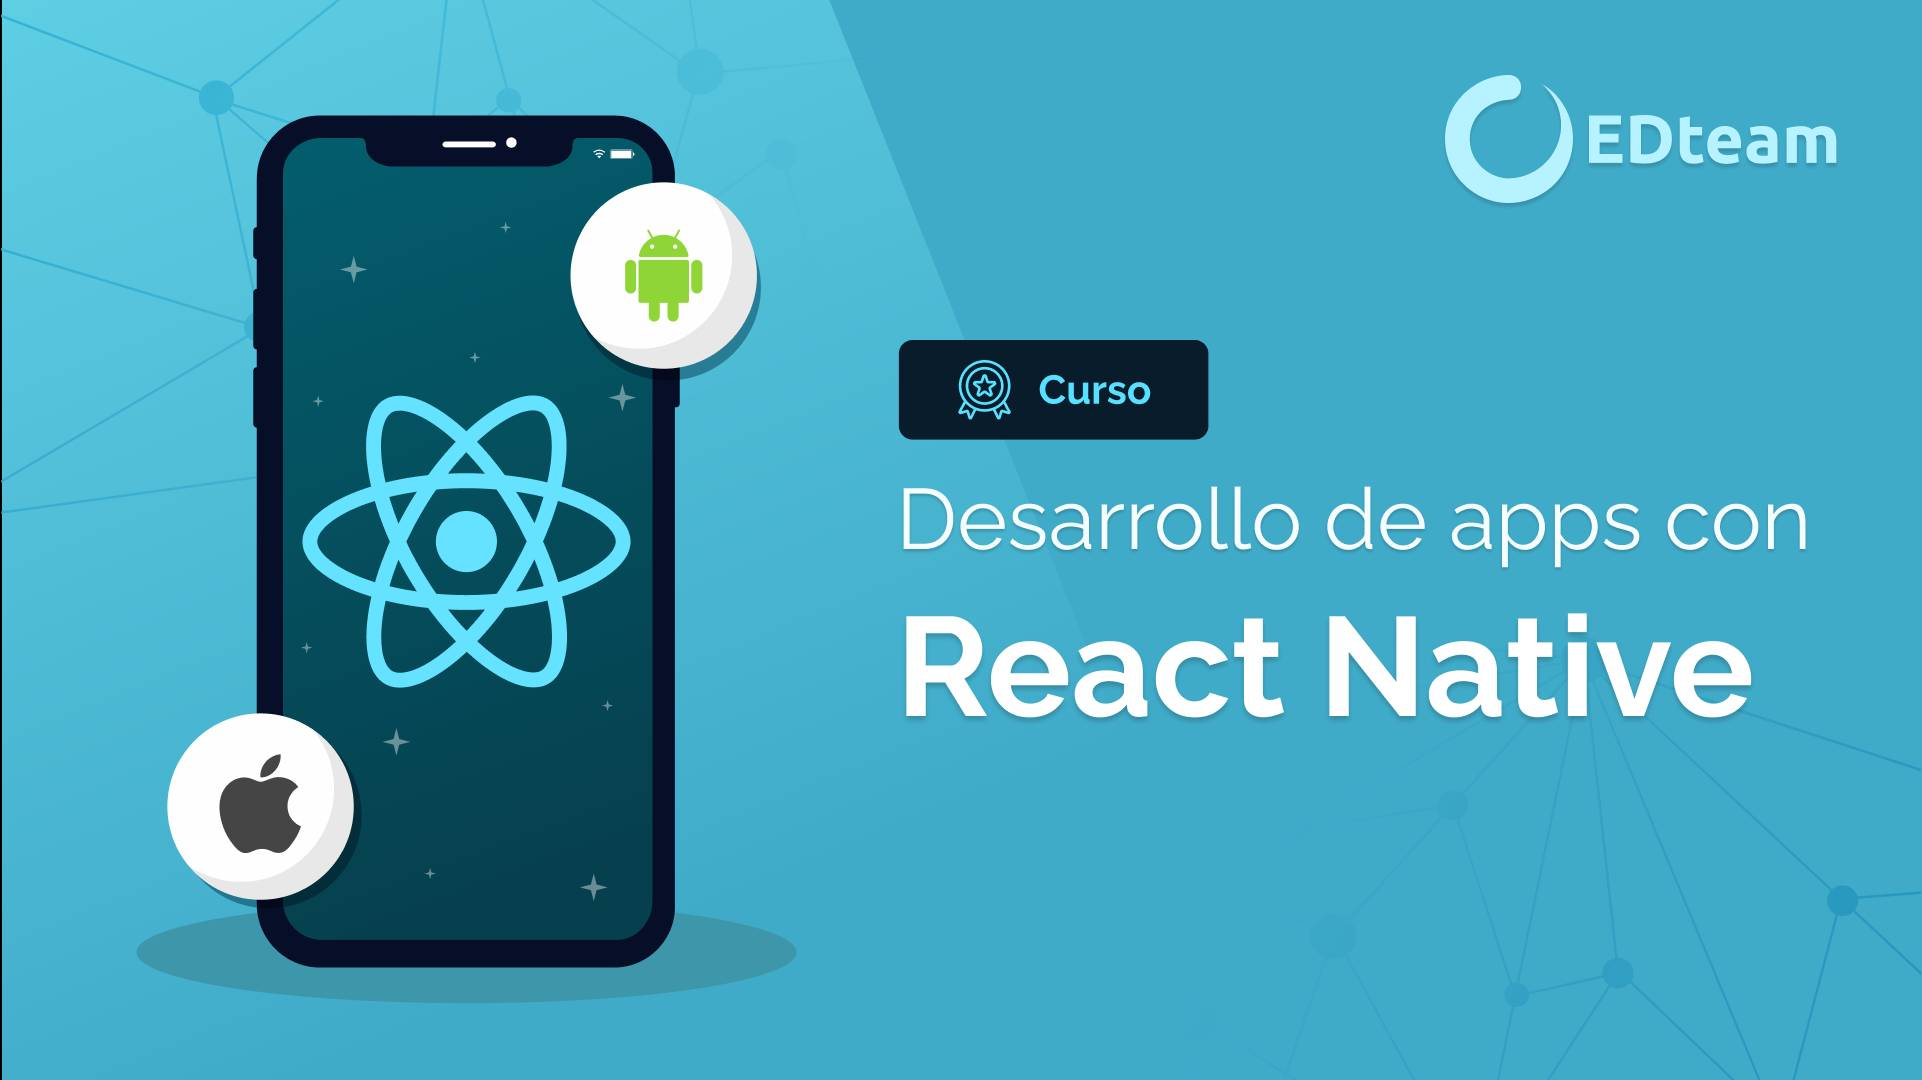 Desarrollo de apps con React Native